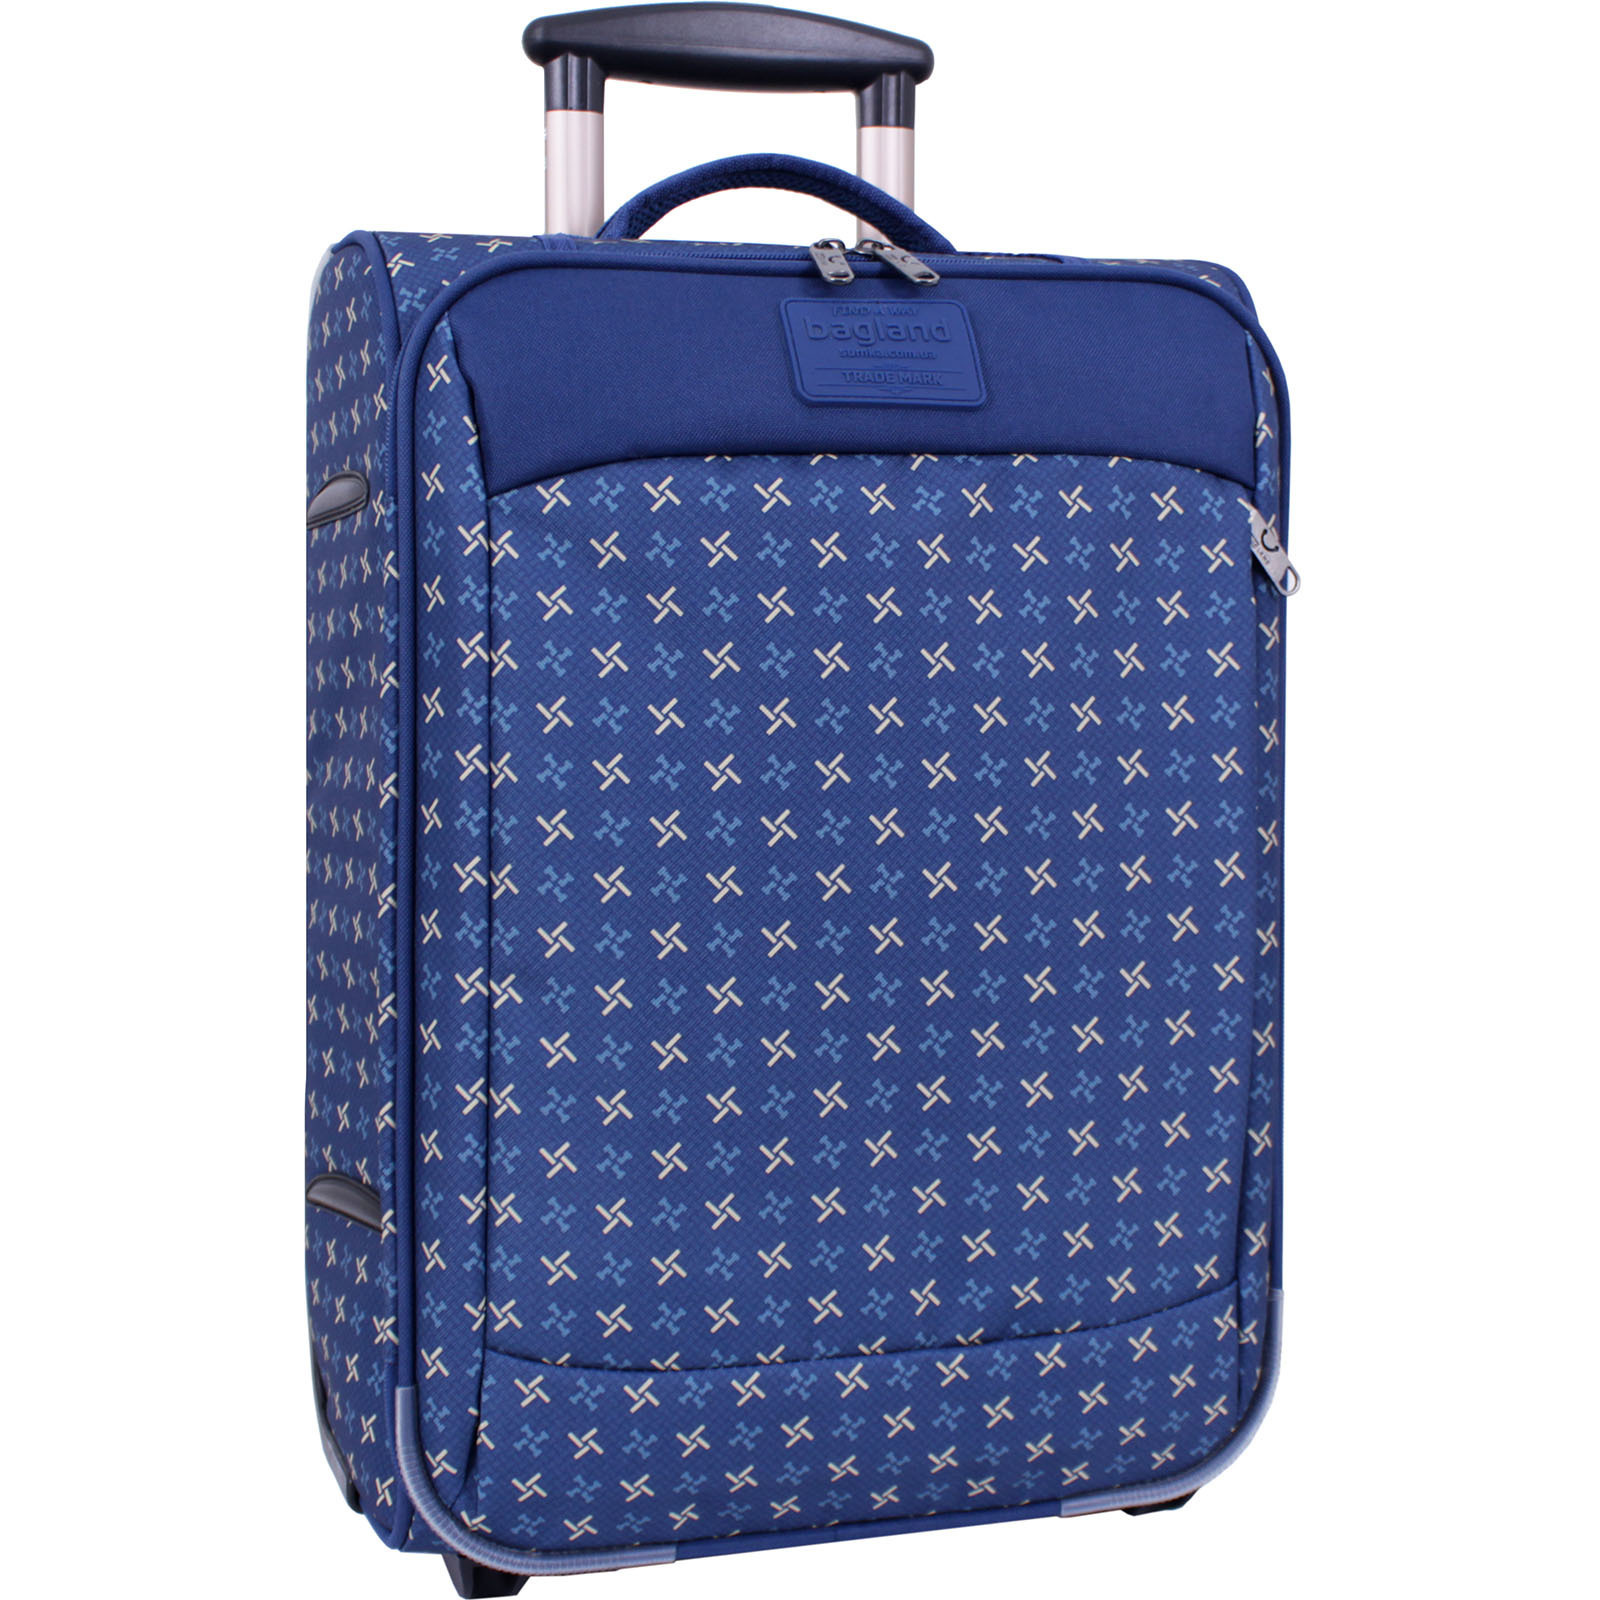 Дорожные чемоданы Чемодан Bagland Vichenzo 32 л. сублімація 463 (0037666194) IMG_4095_суб.463_.JPG